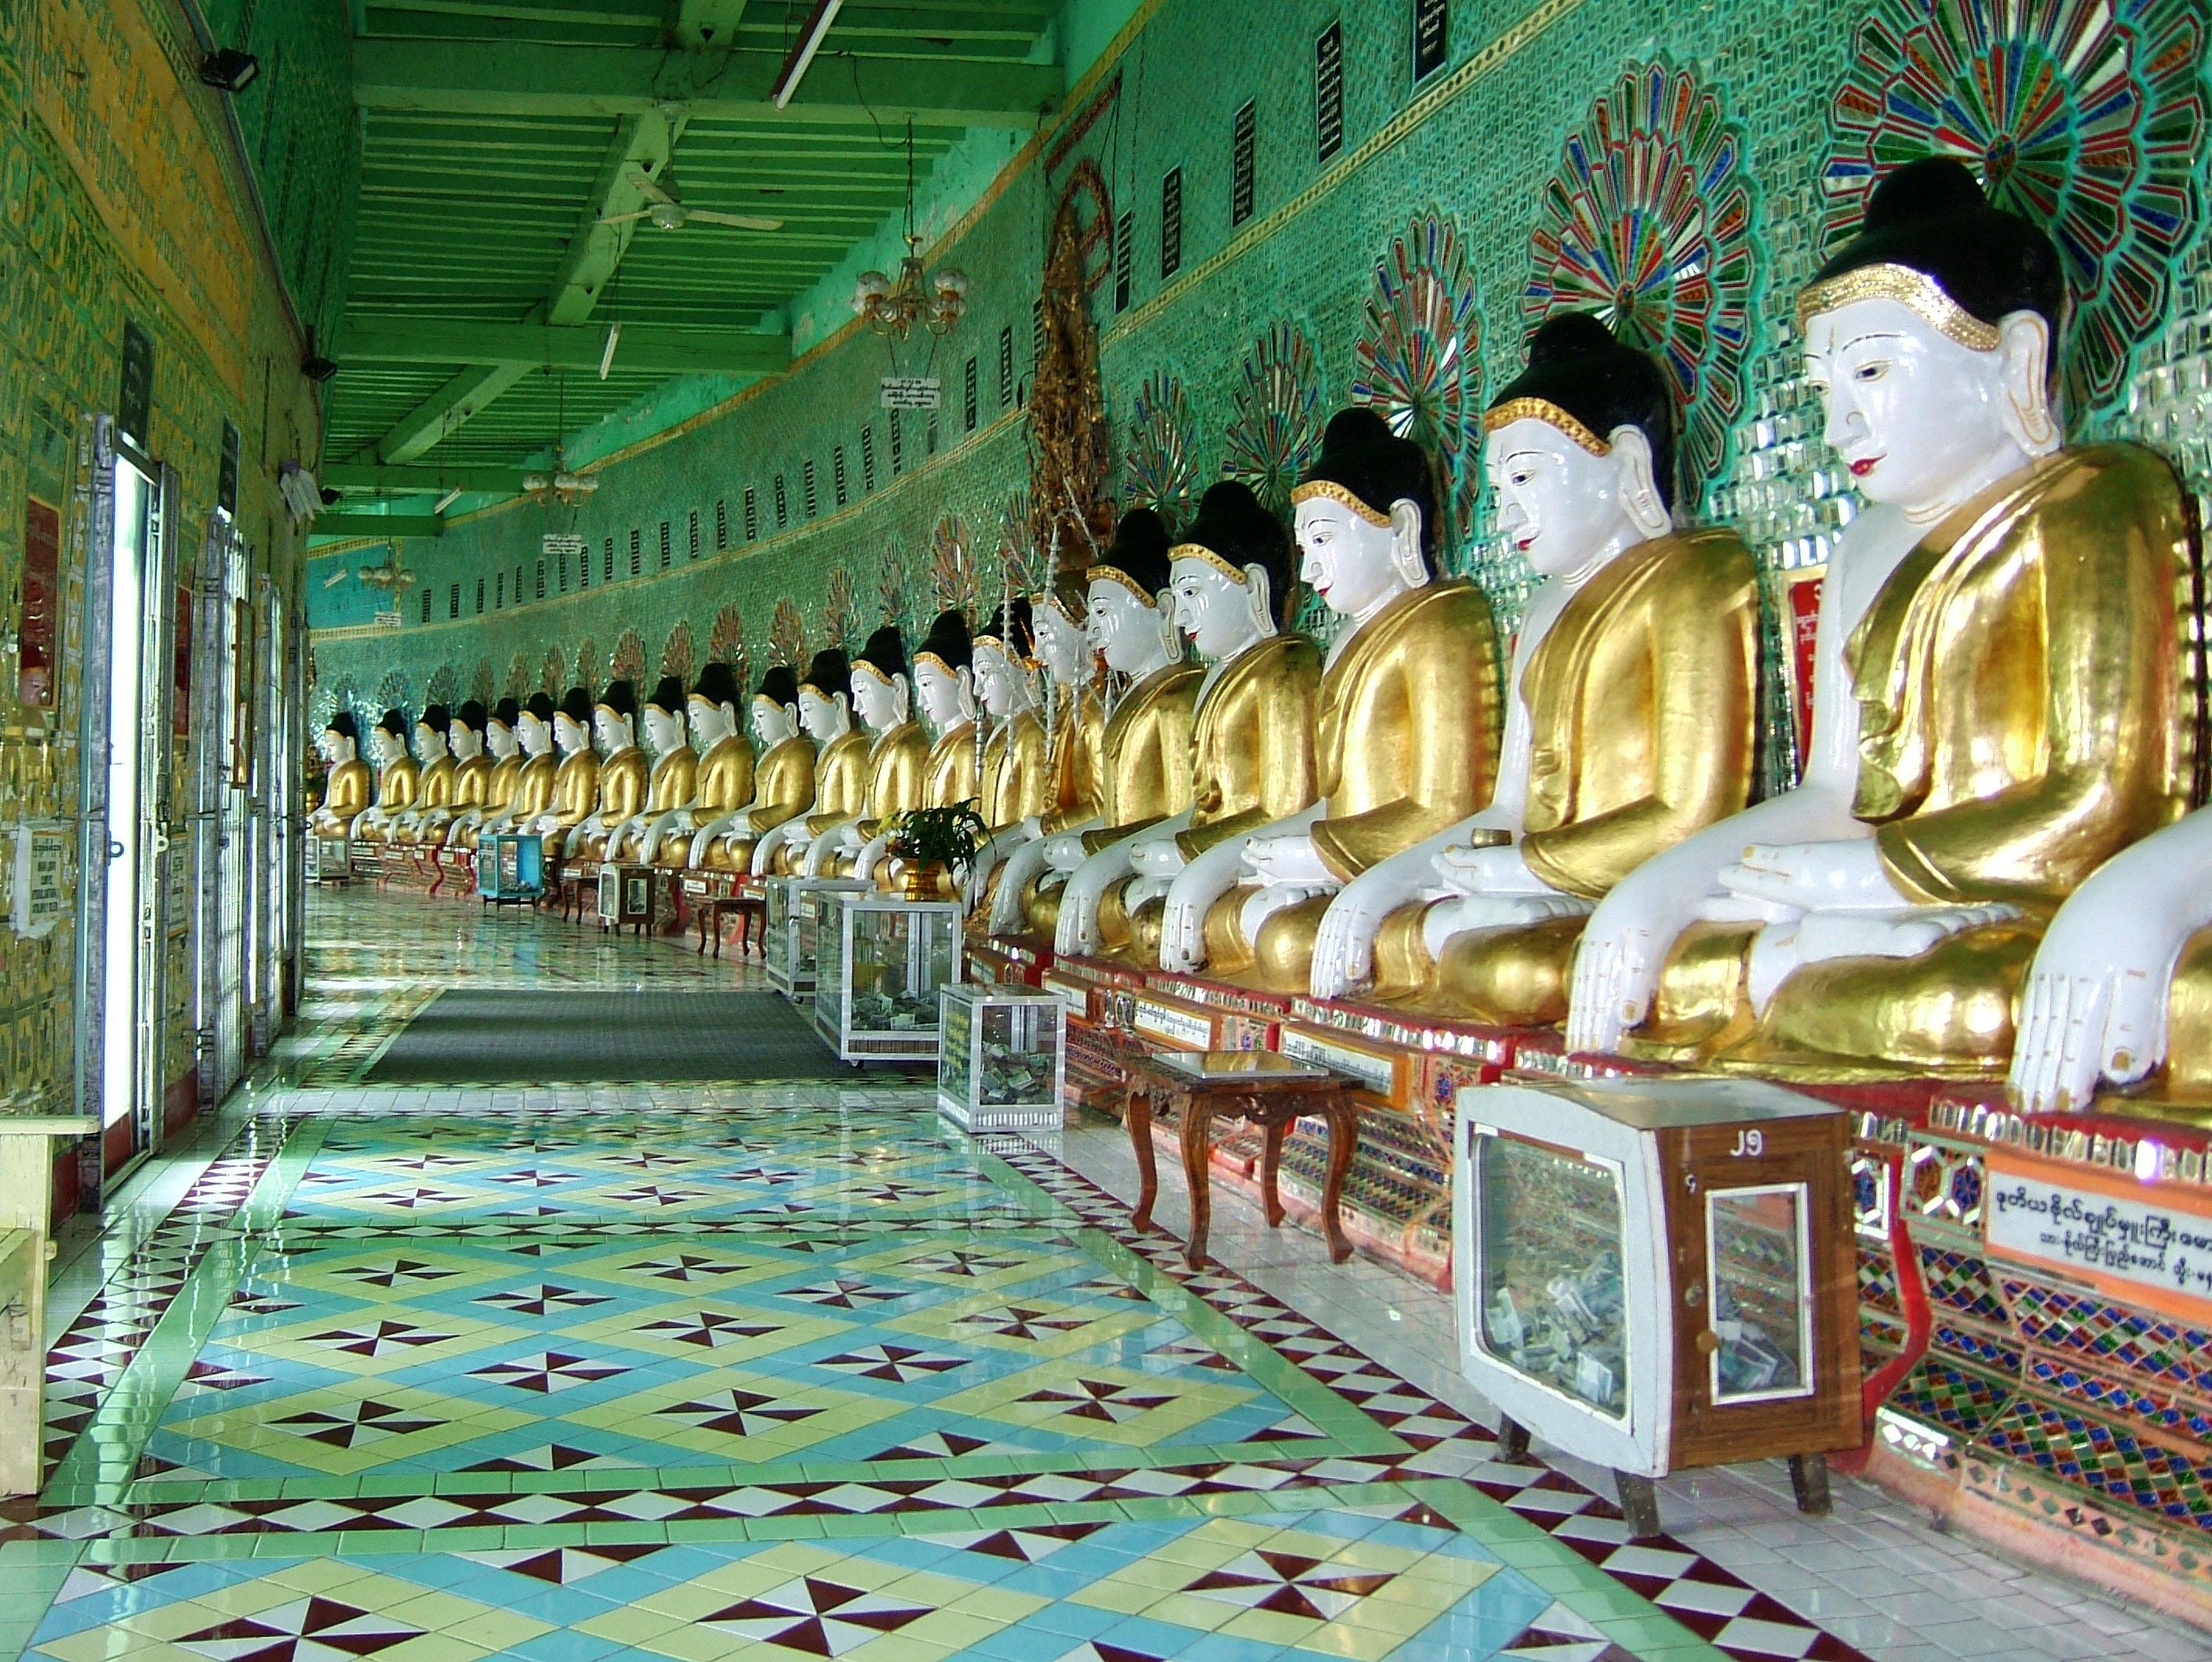 Sagaing U Min Thounzeh Pagoda many faces of the Buddha Dec 2000 08